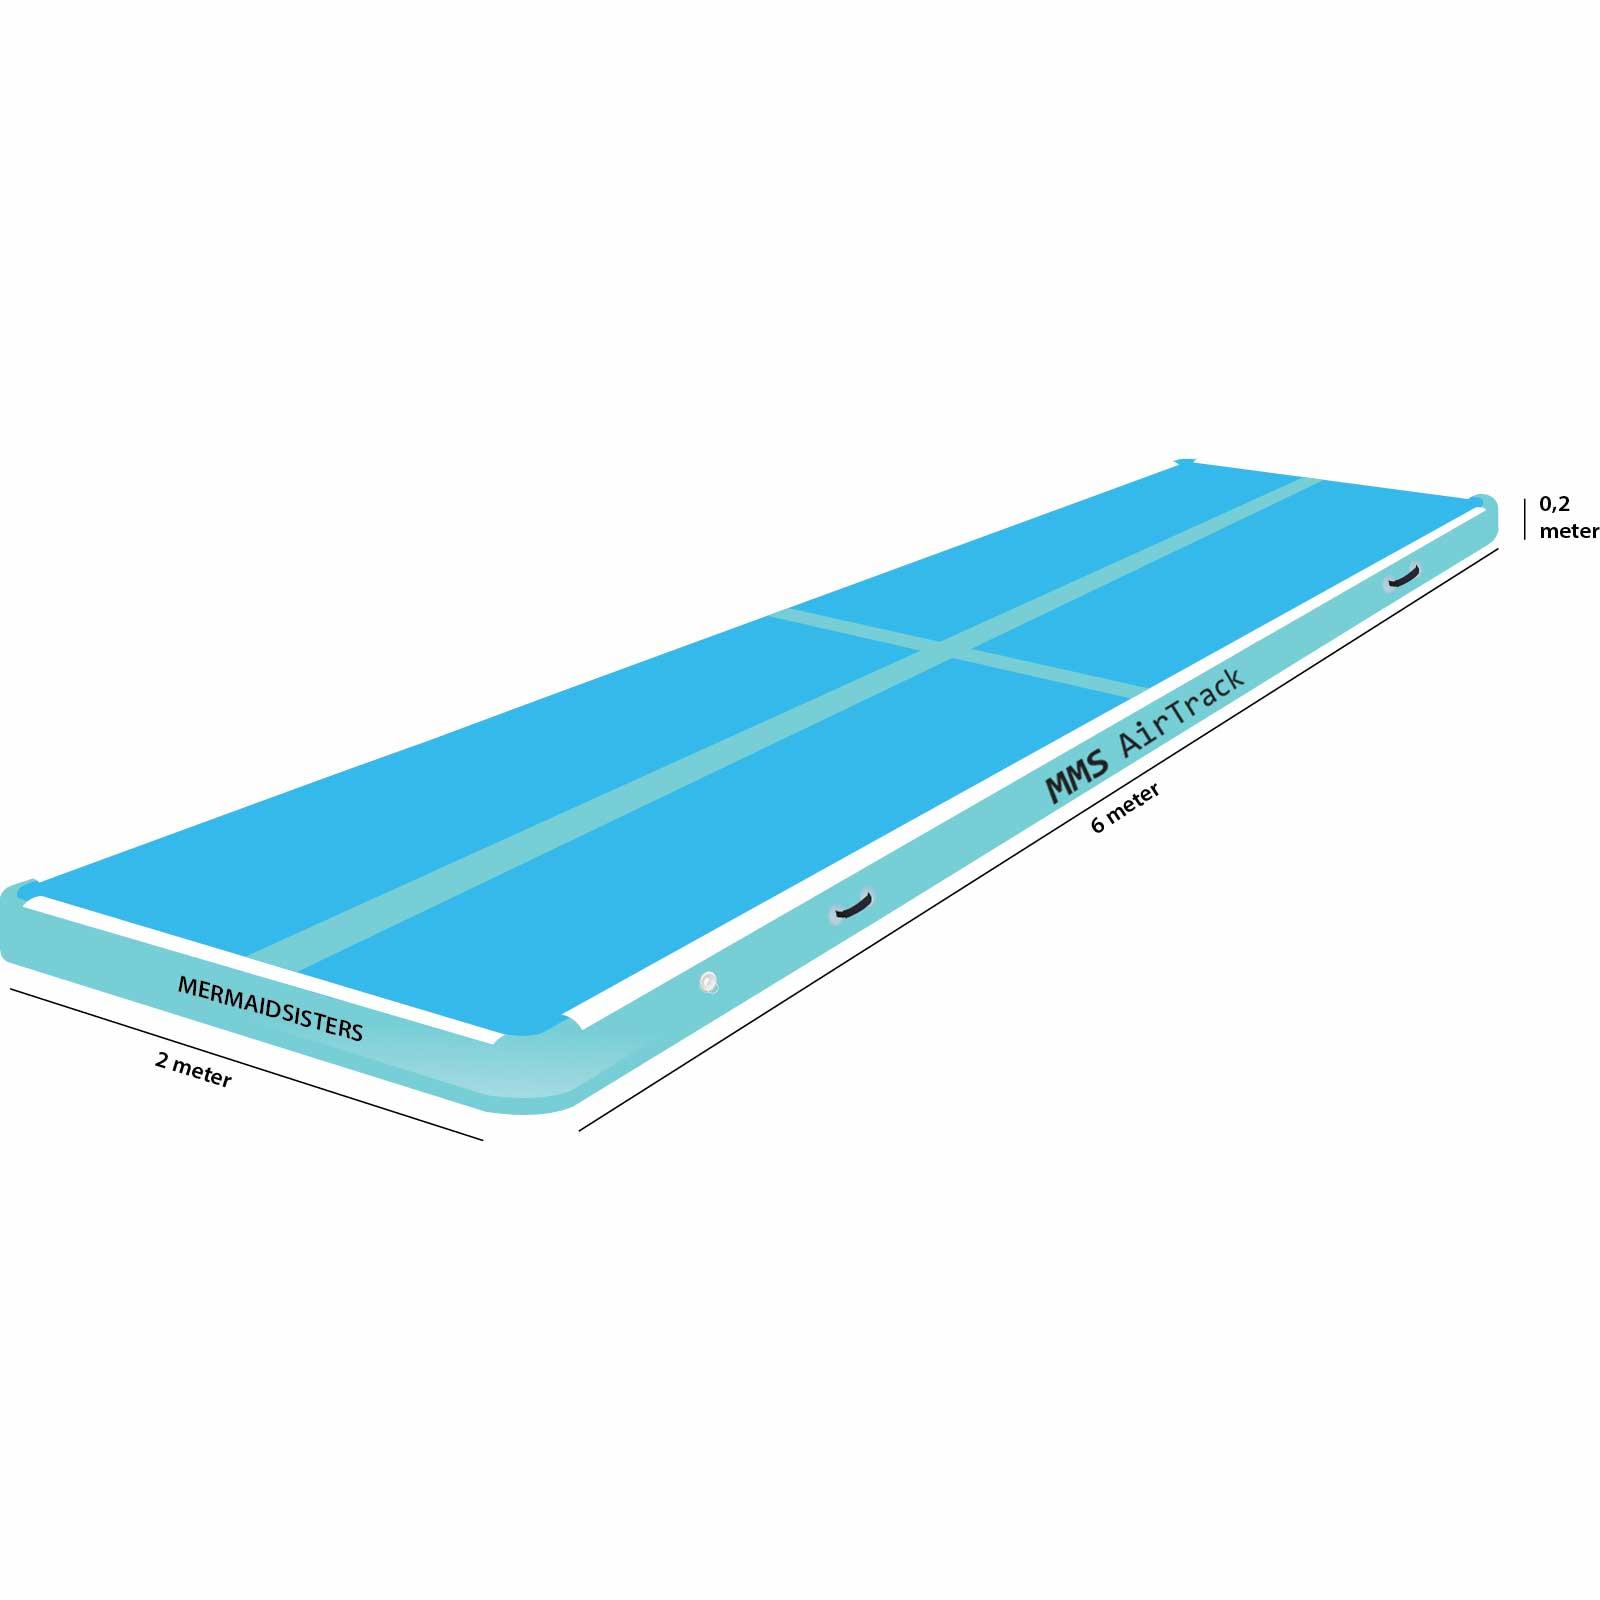 Airtrack 6 meter x 2 x 0,2 blauw